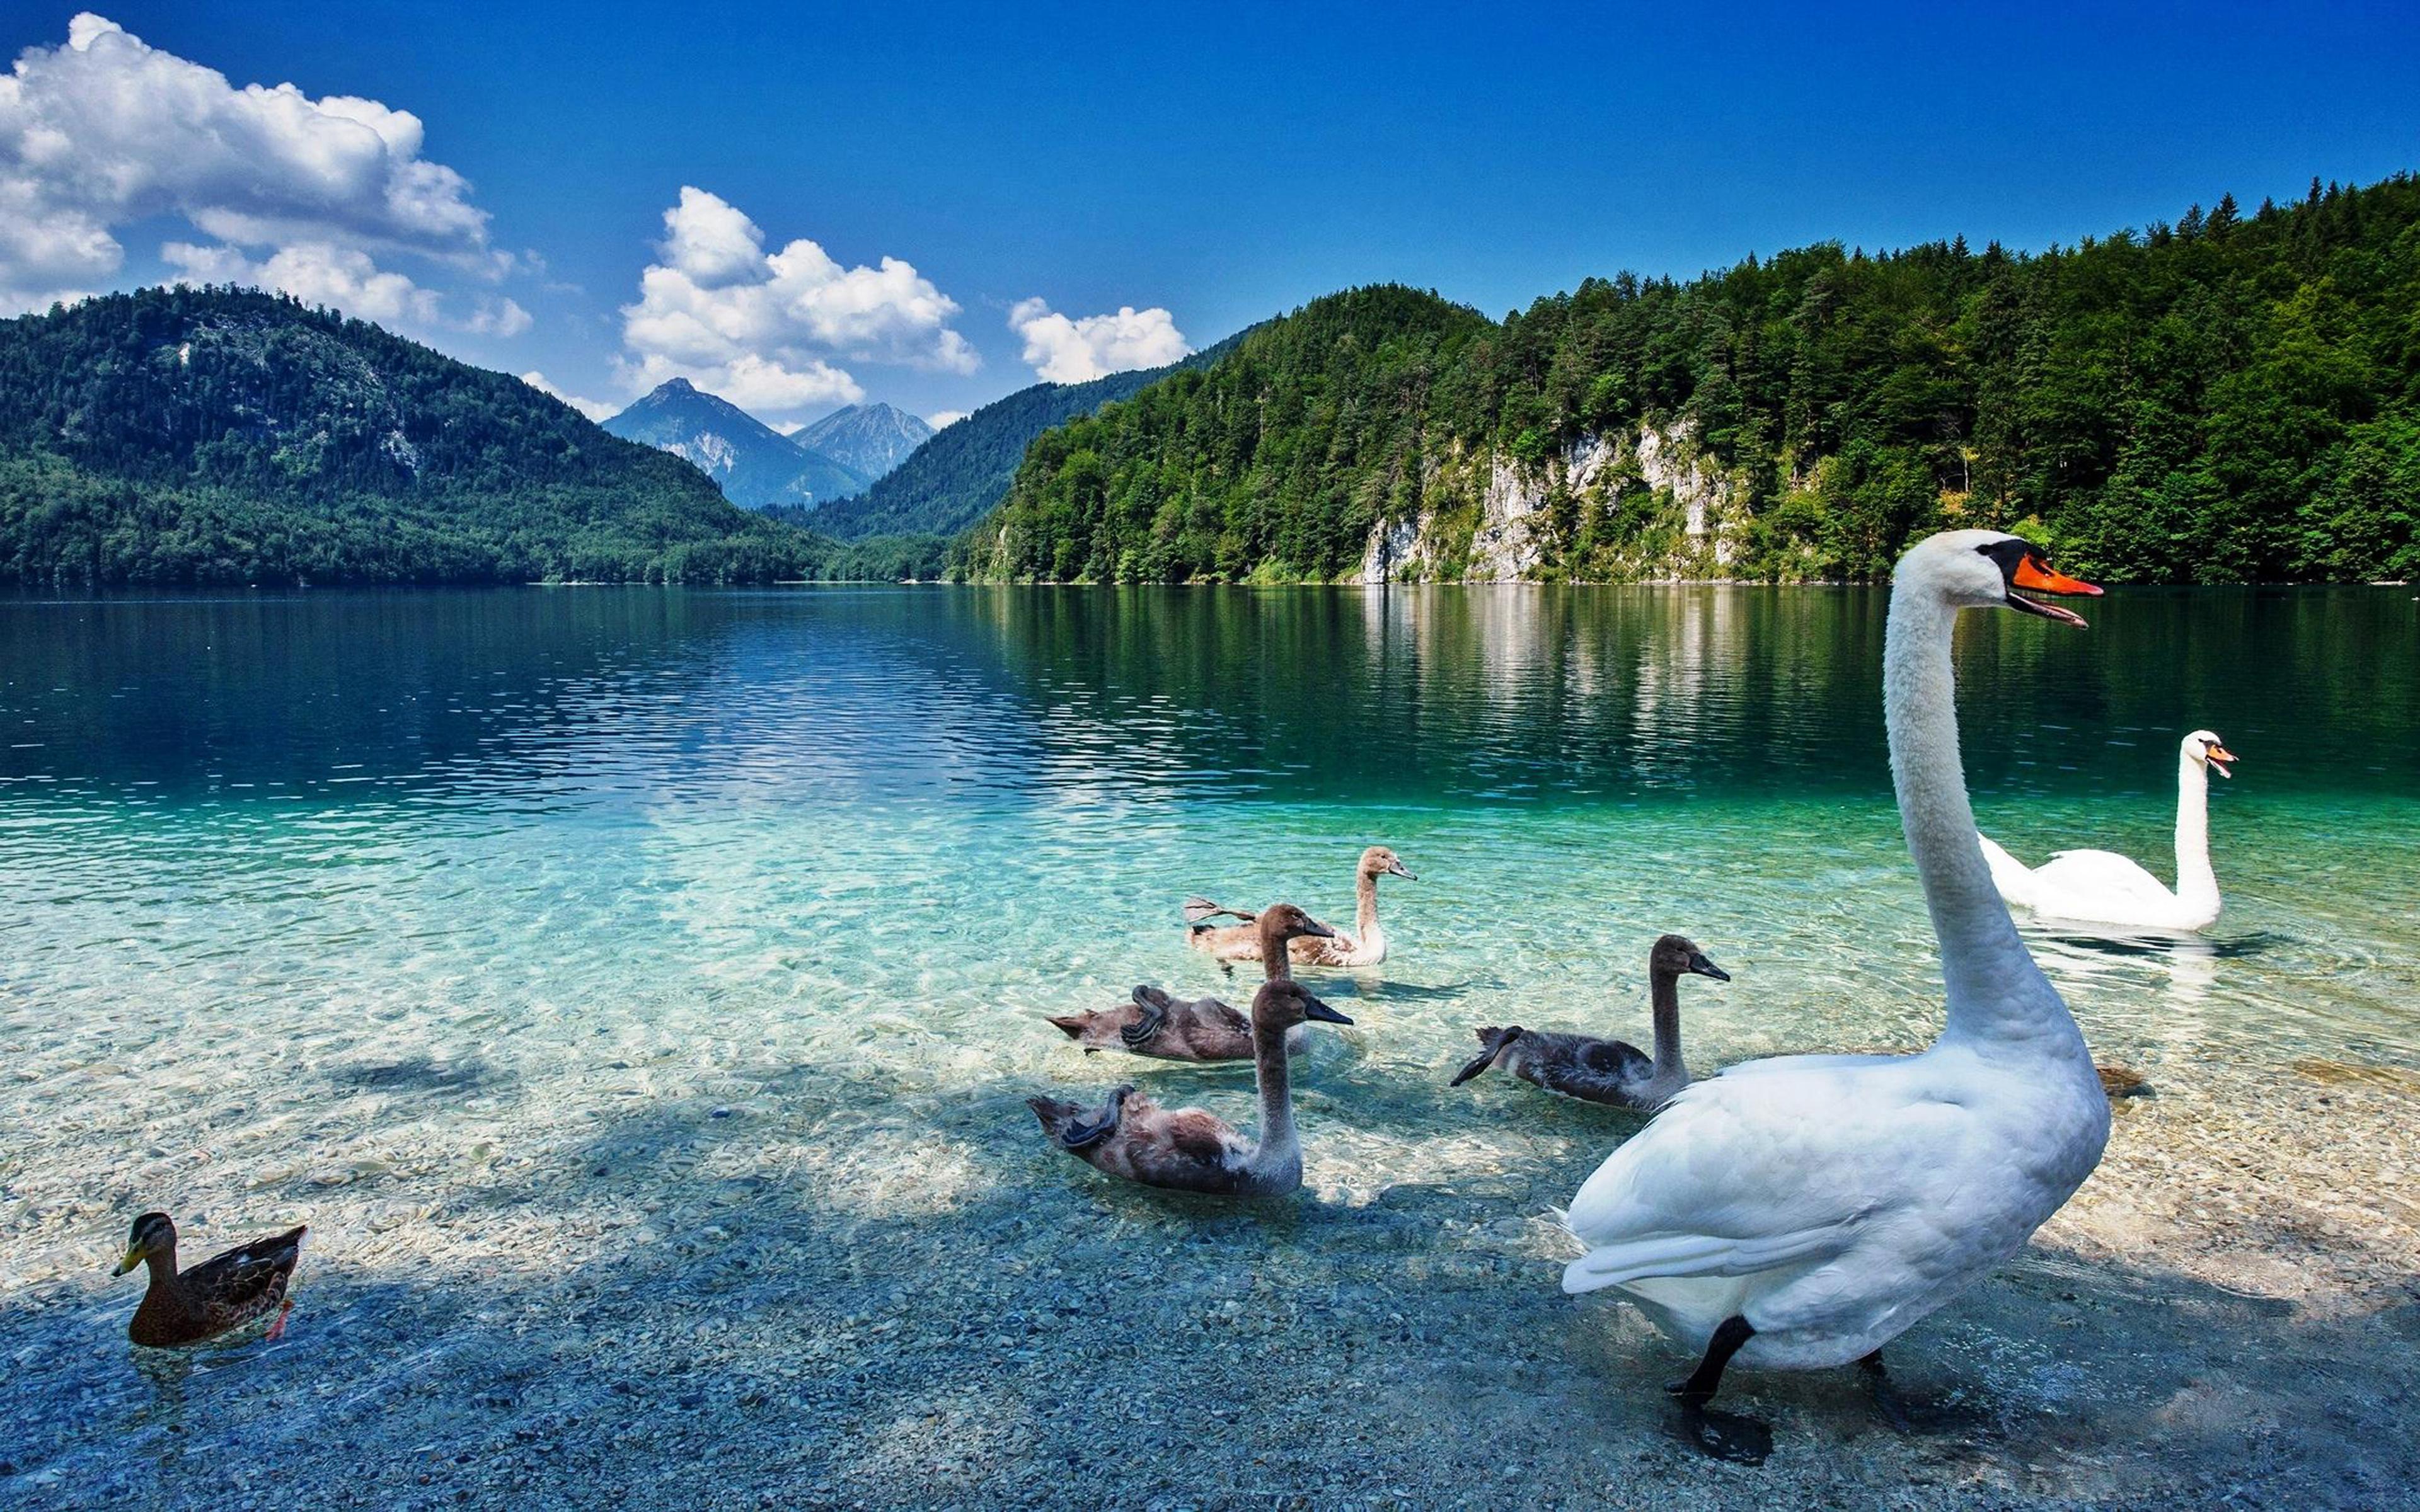 Fall Church Pictures Free Wallpaper Swan Lake With Crystal Clear Water Priroda Planini Green